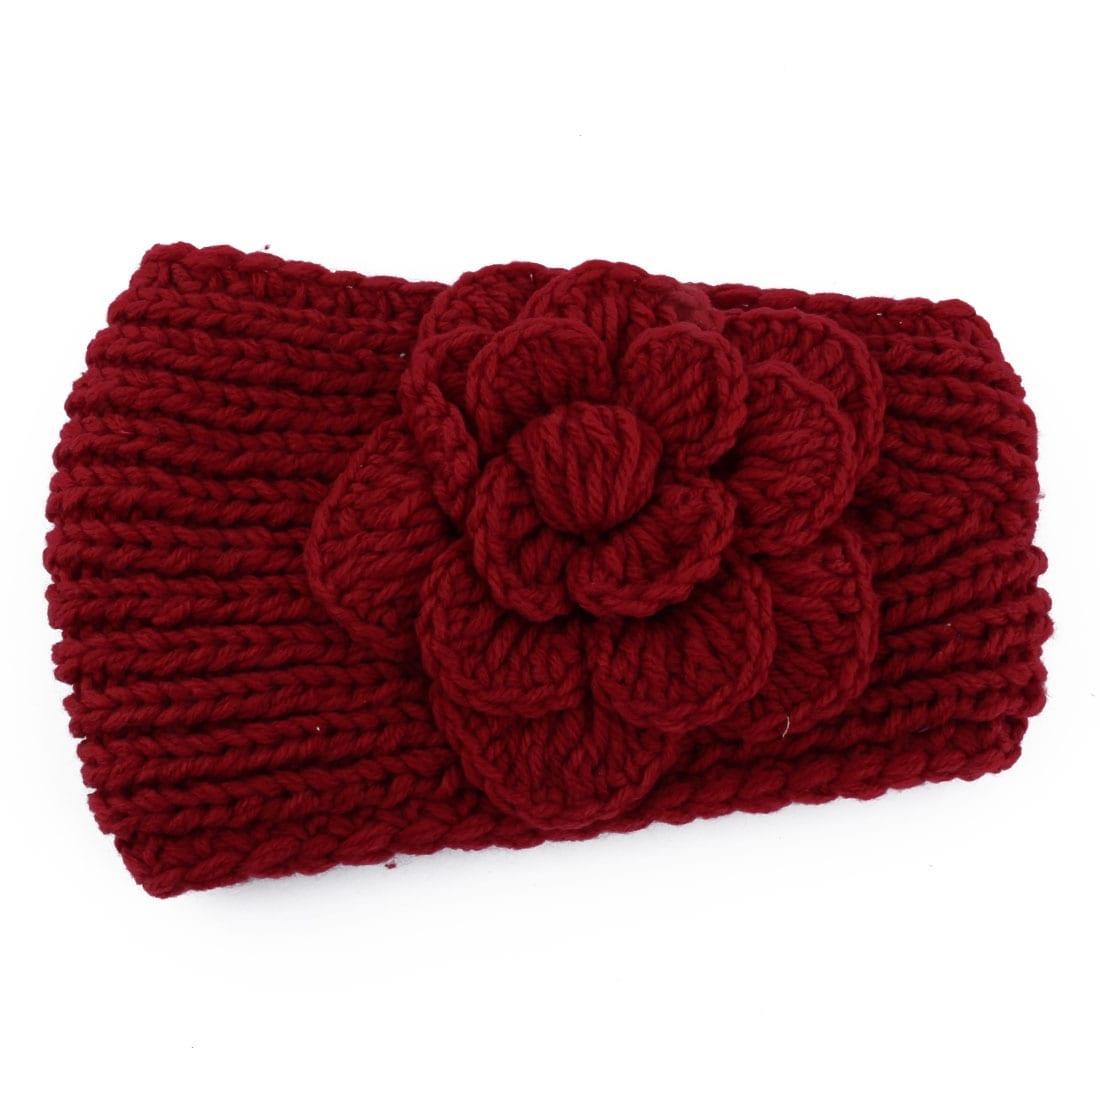 Winter Women Knitting Crochet Camellia Flower Hair Headband Headwrap Dark  Red 006bc4cfba2